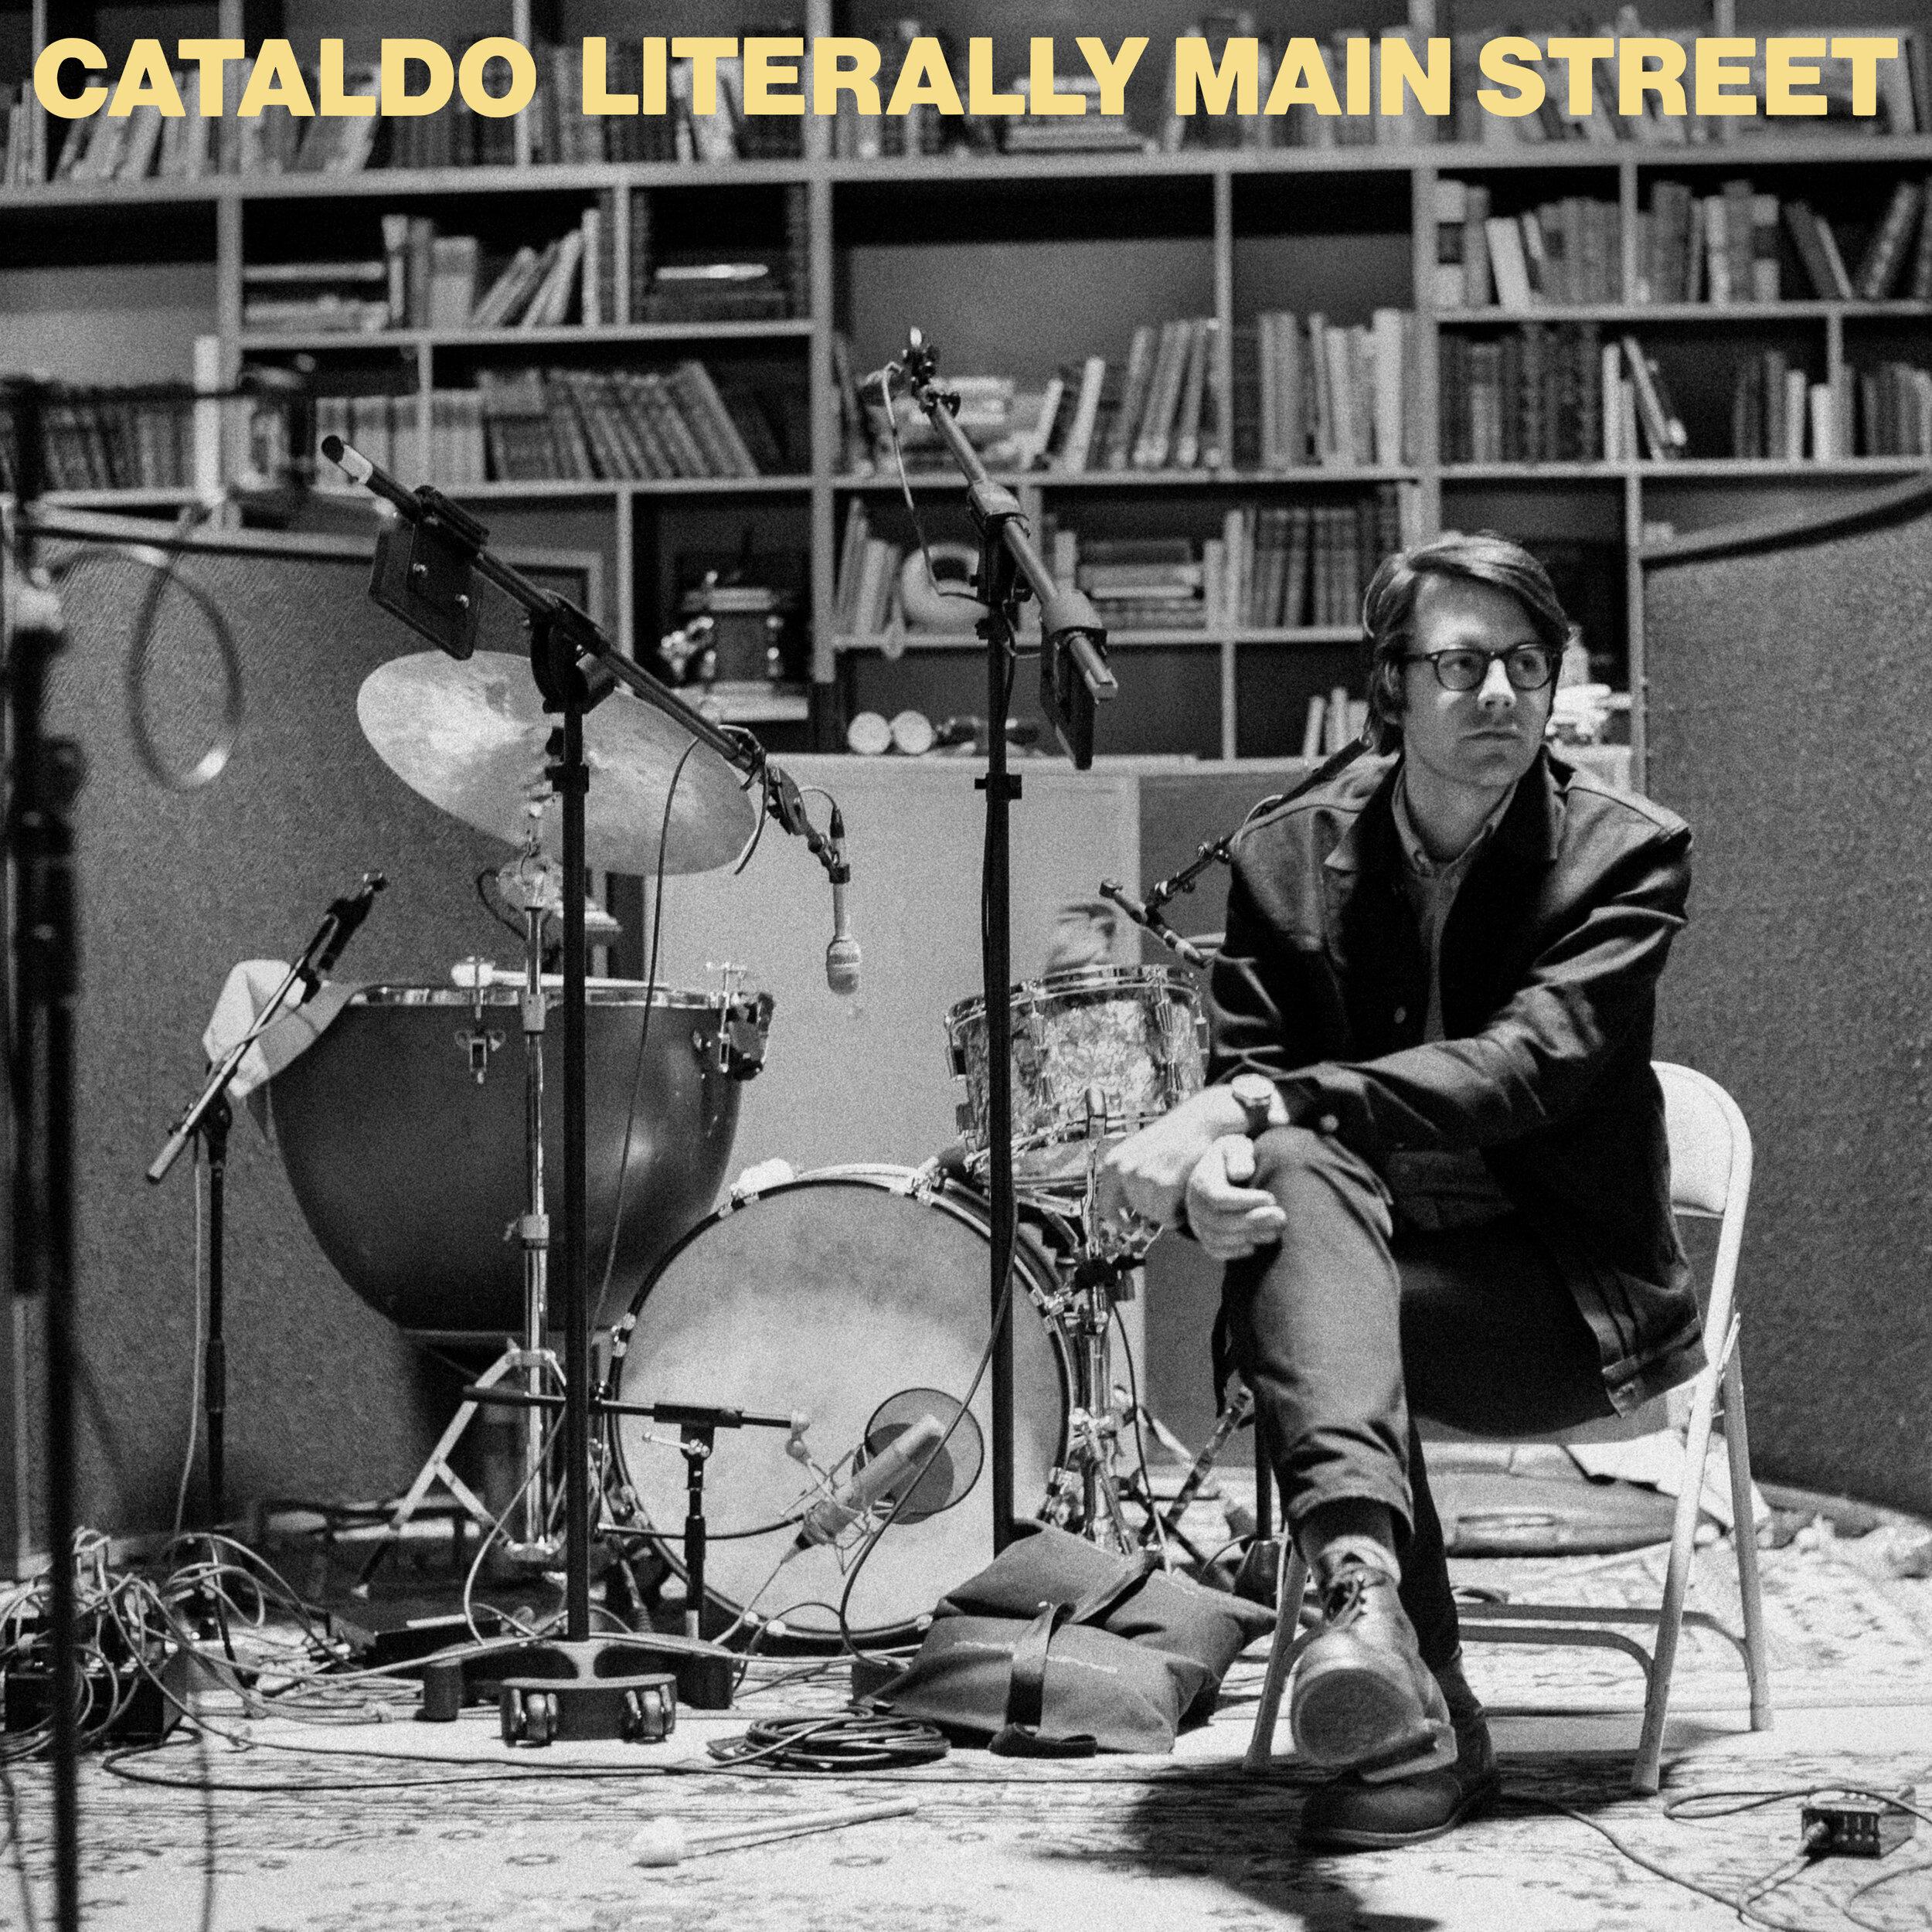 cataldo-hires (1).jpg